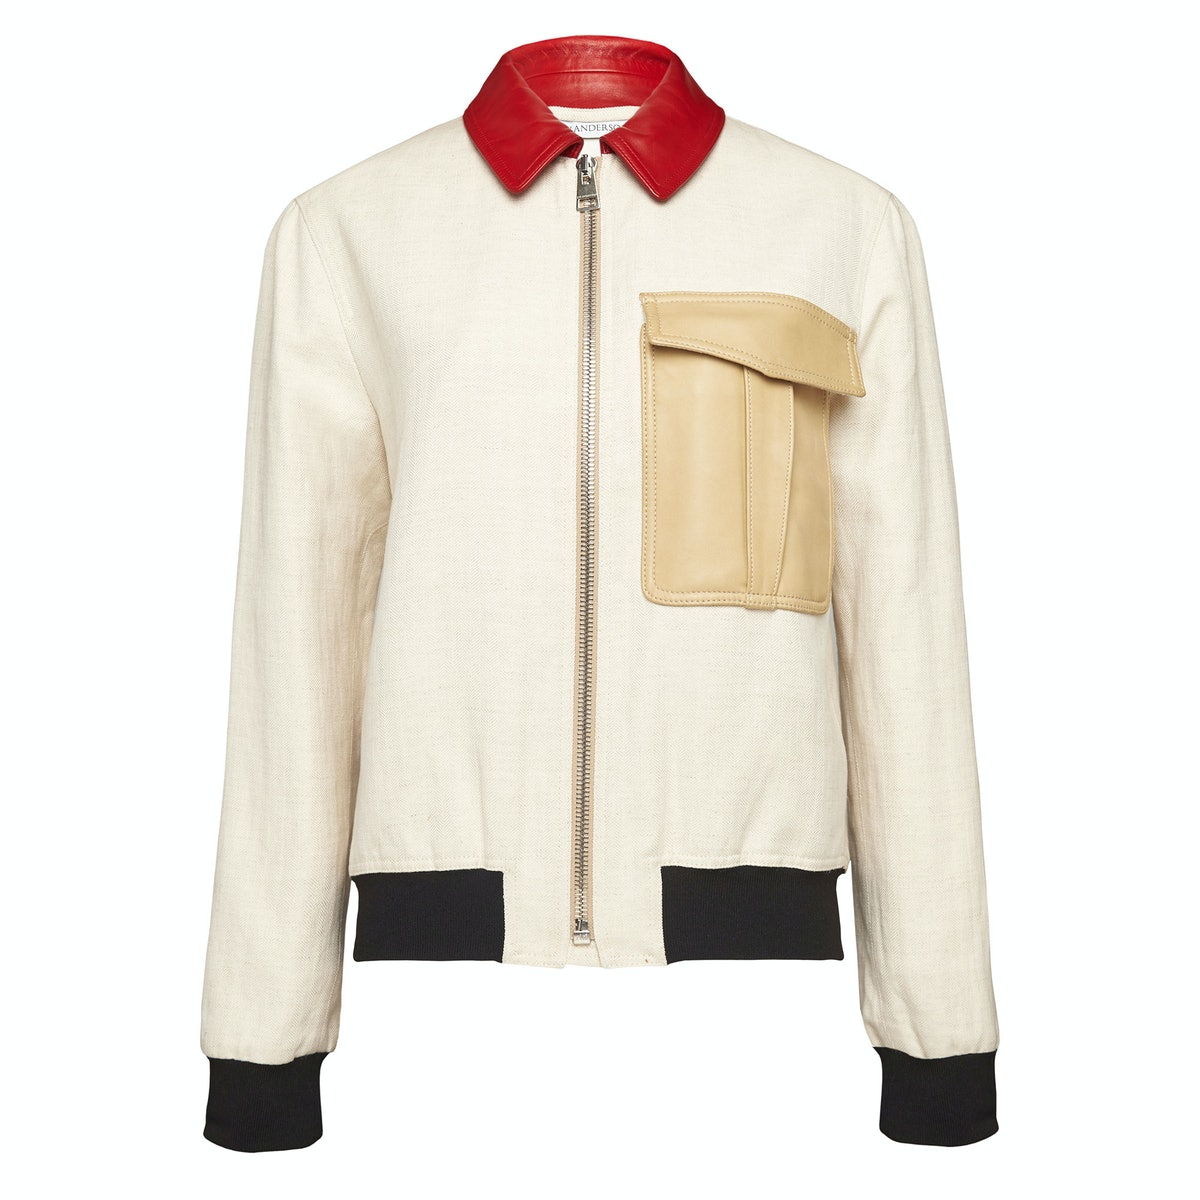 J.W. Anderson coat